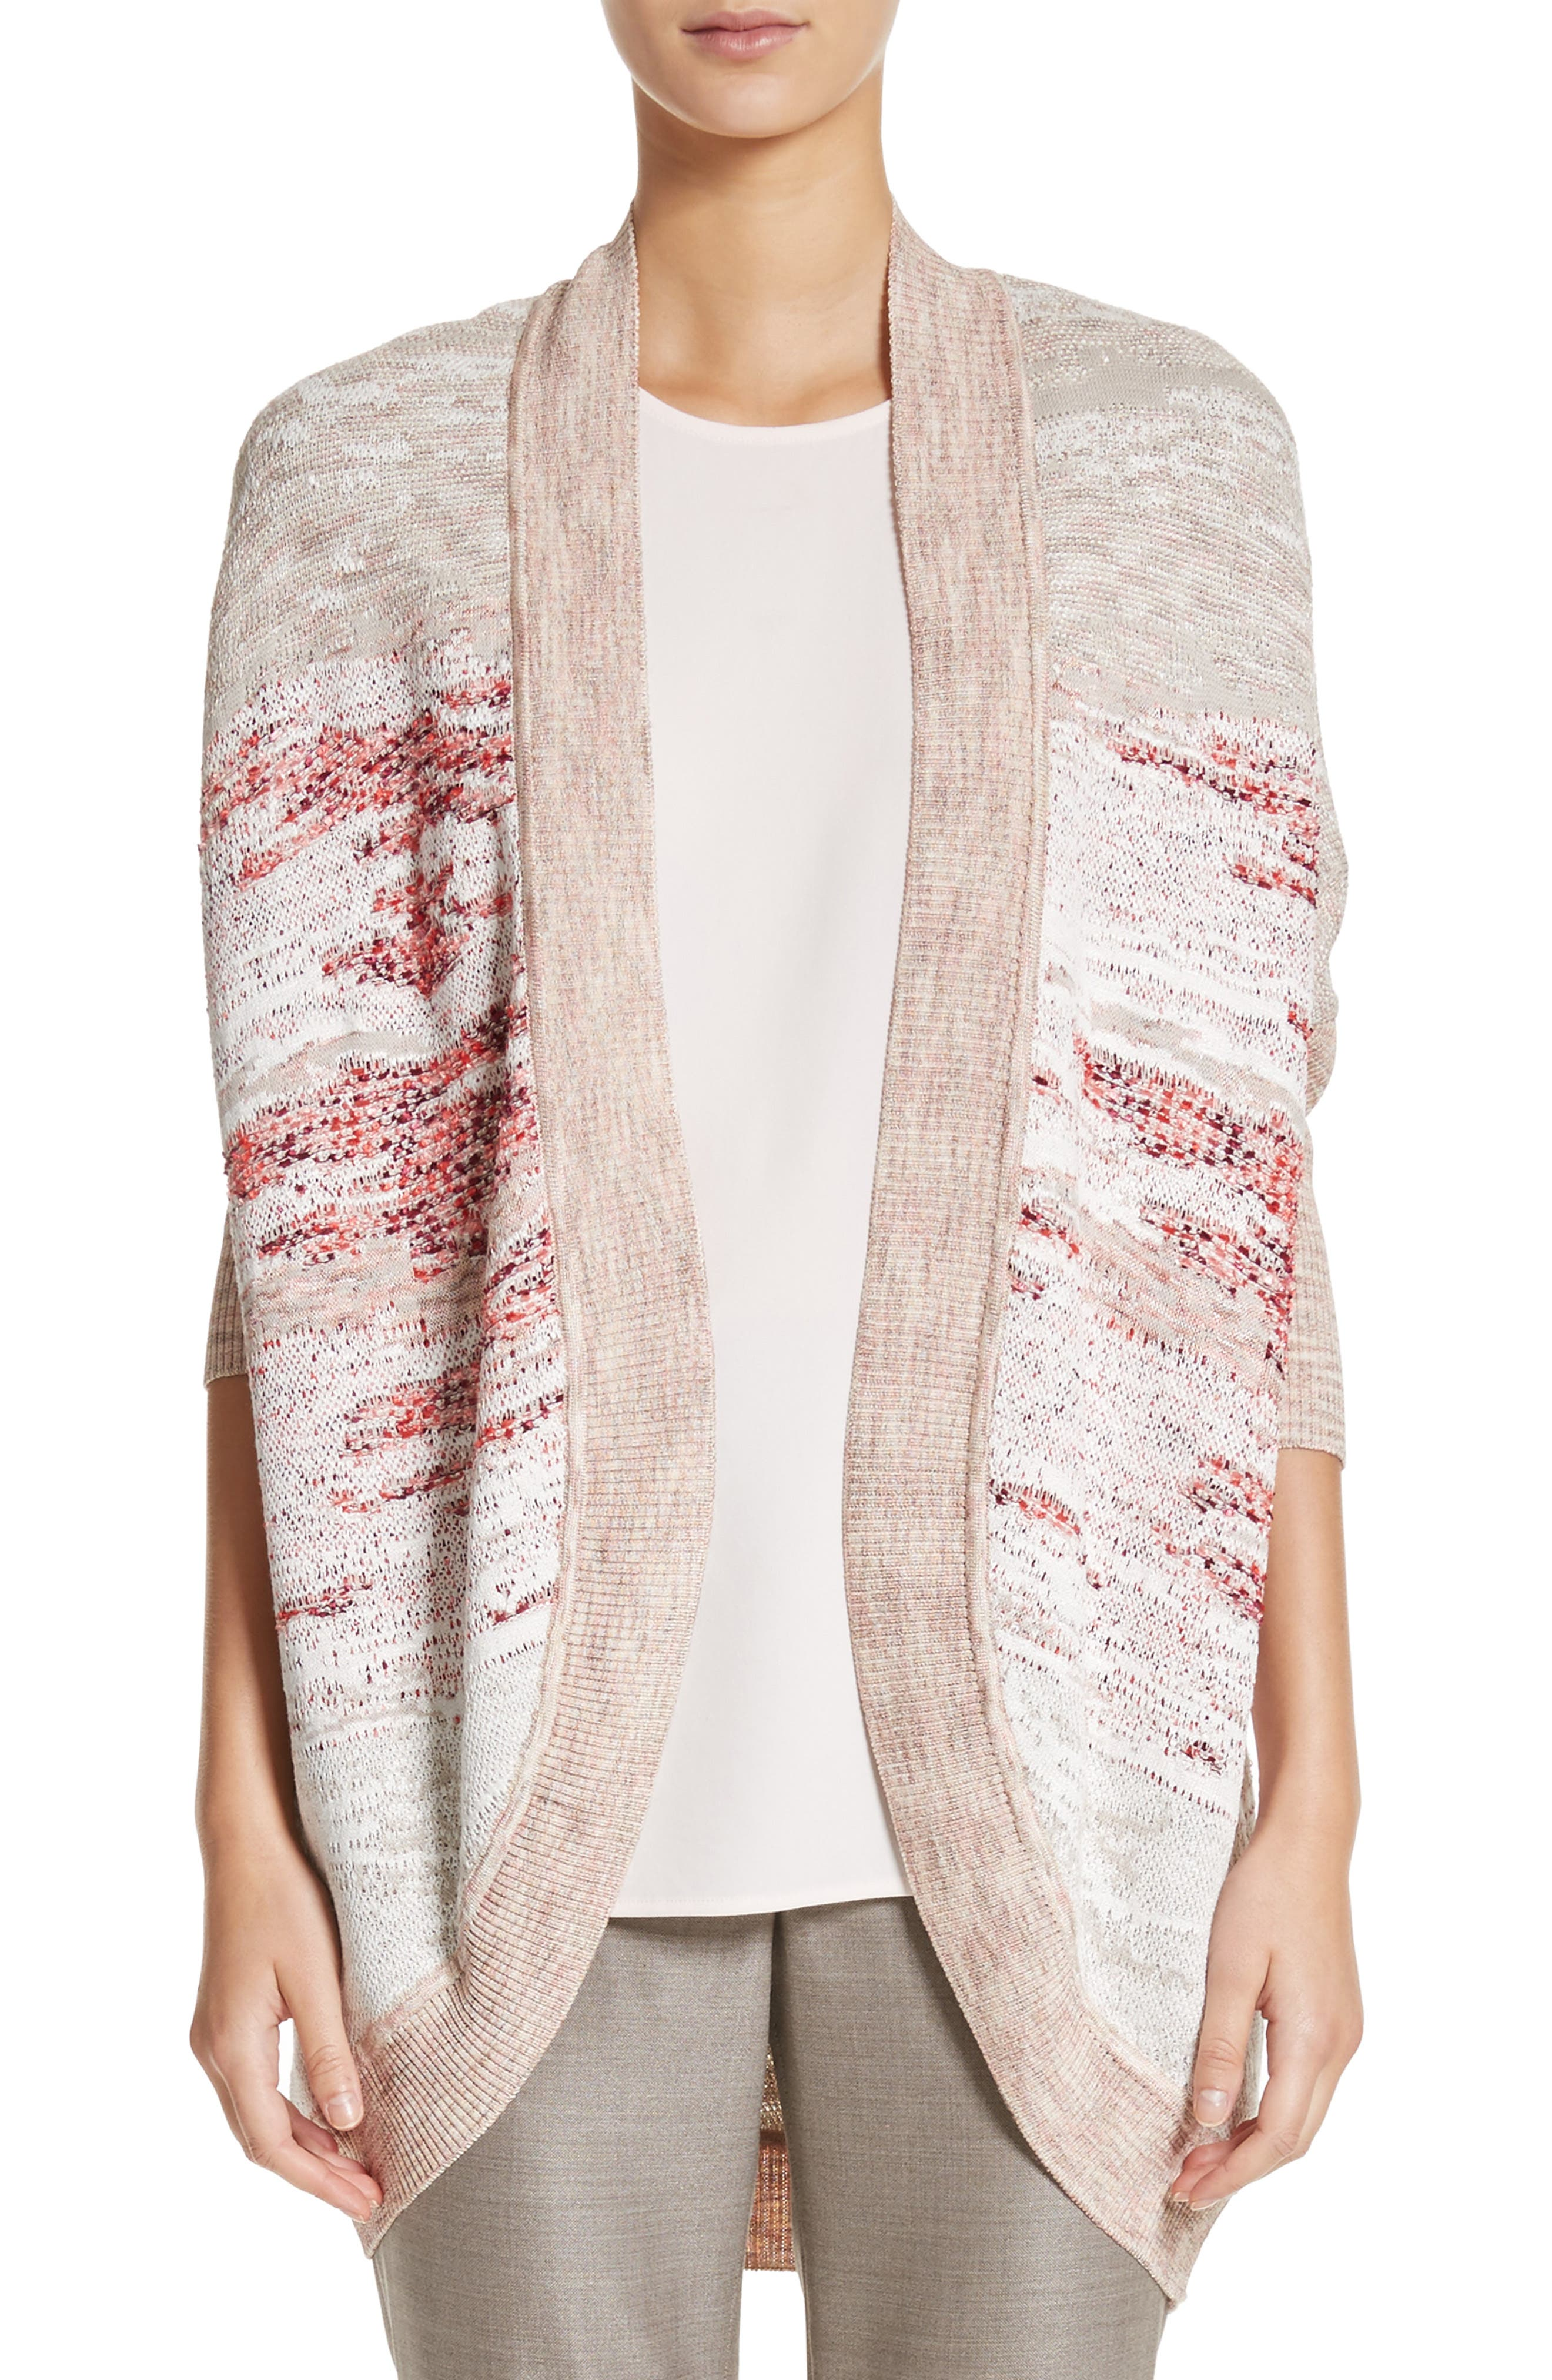 Ombré Textured Jacquard Knit Cardigan,                             Main thumbnail 1, color,                             050